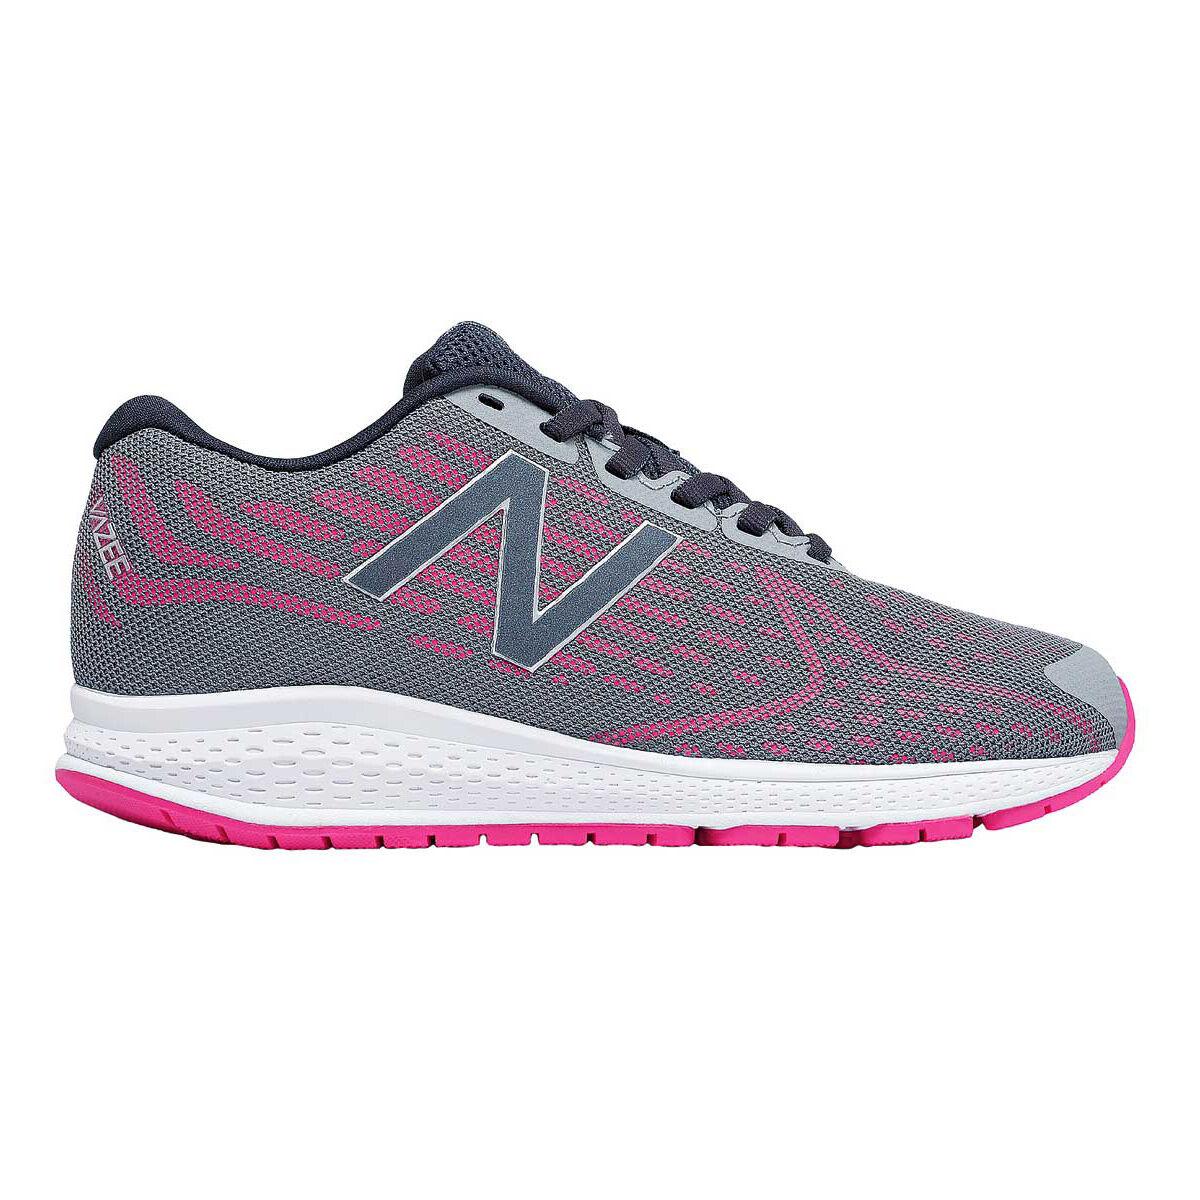 New Balance Vazee Rush v2 Girls Running Shoes Grey Pink US 7